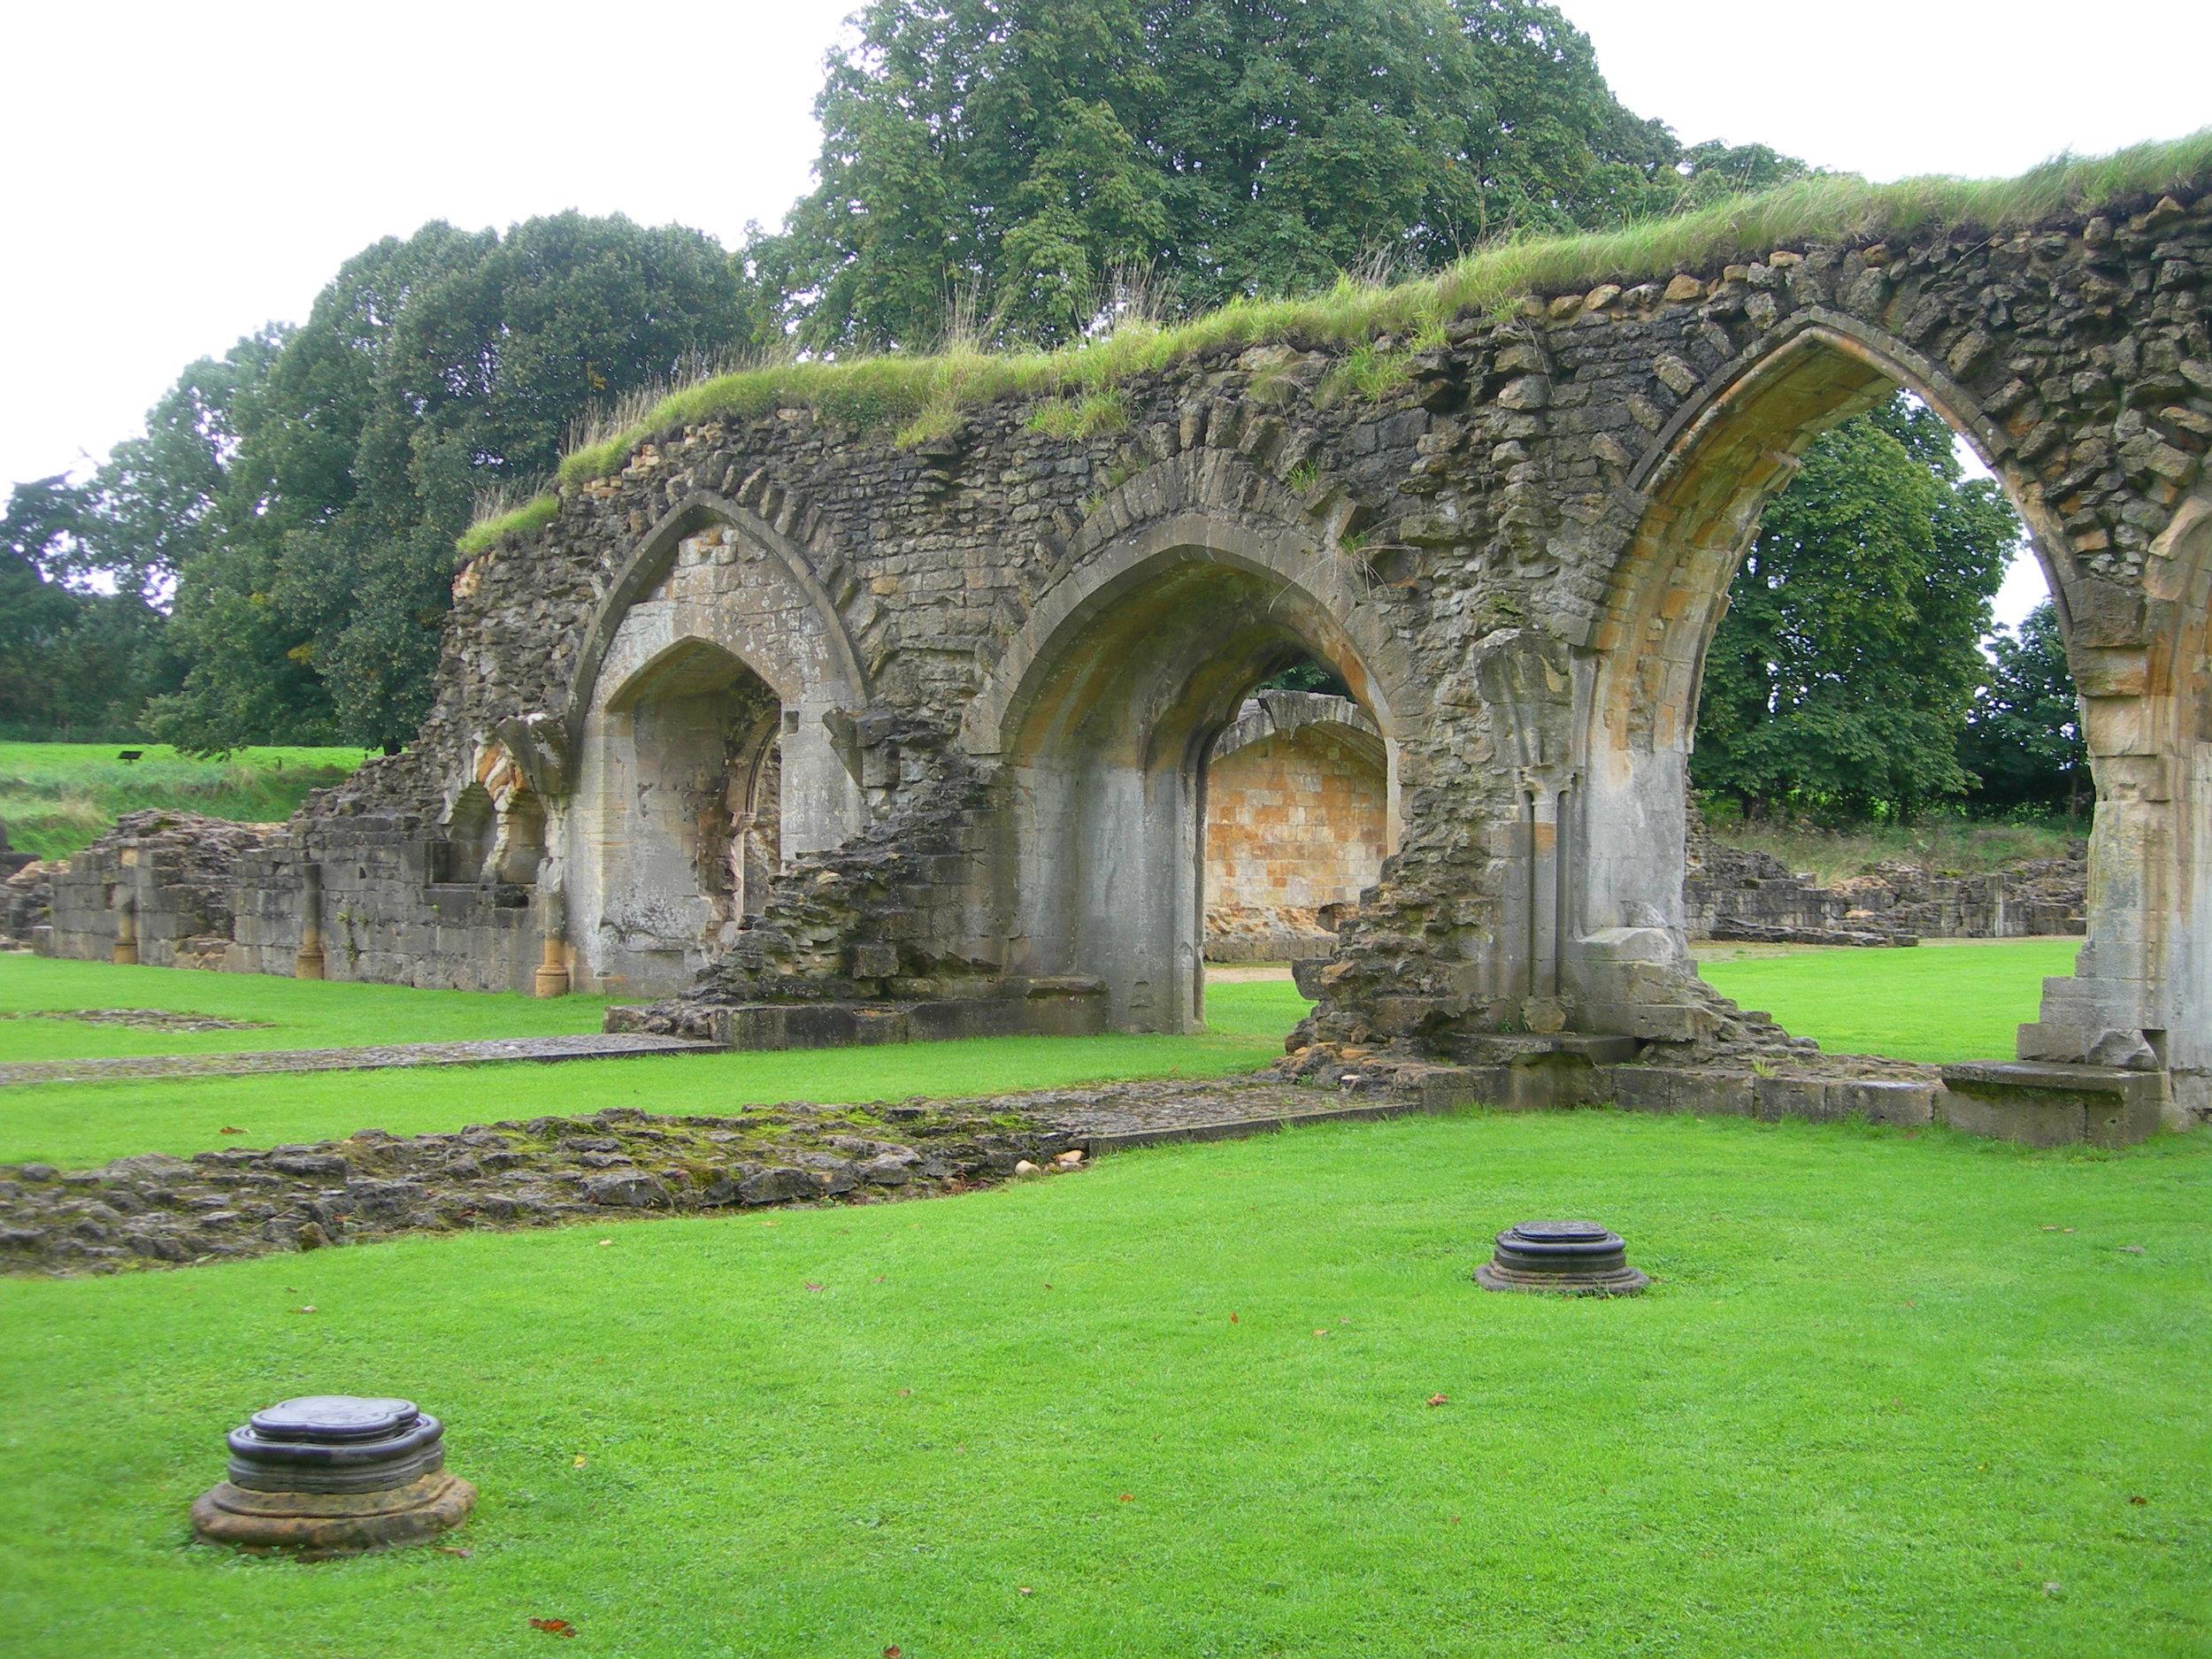 13th century Hailes Abbey, Gloucestershire, England